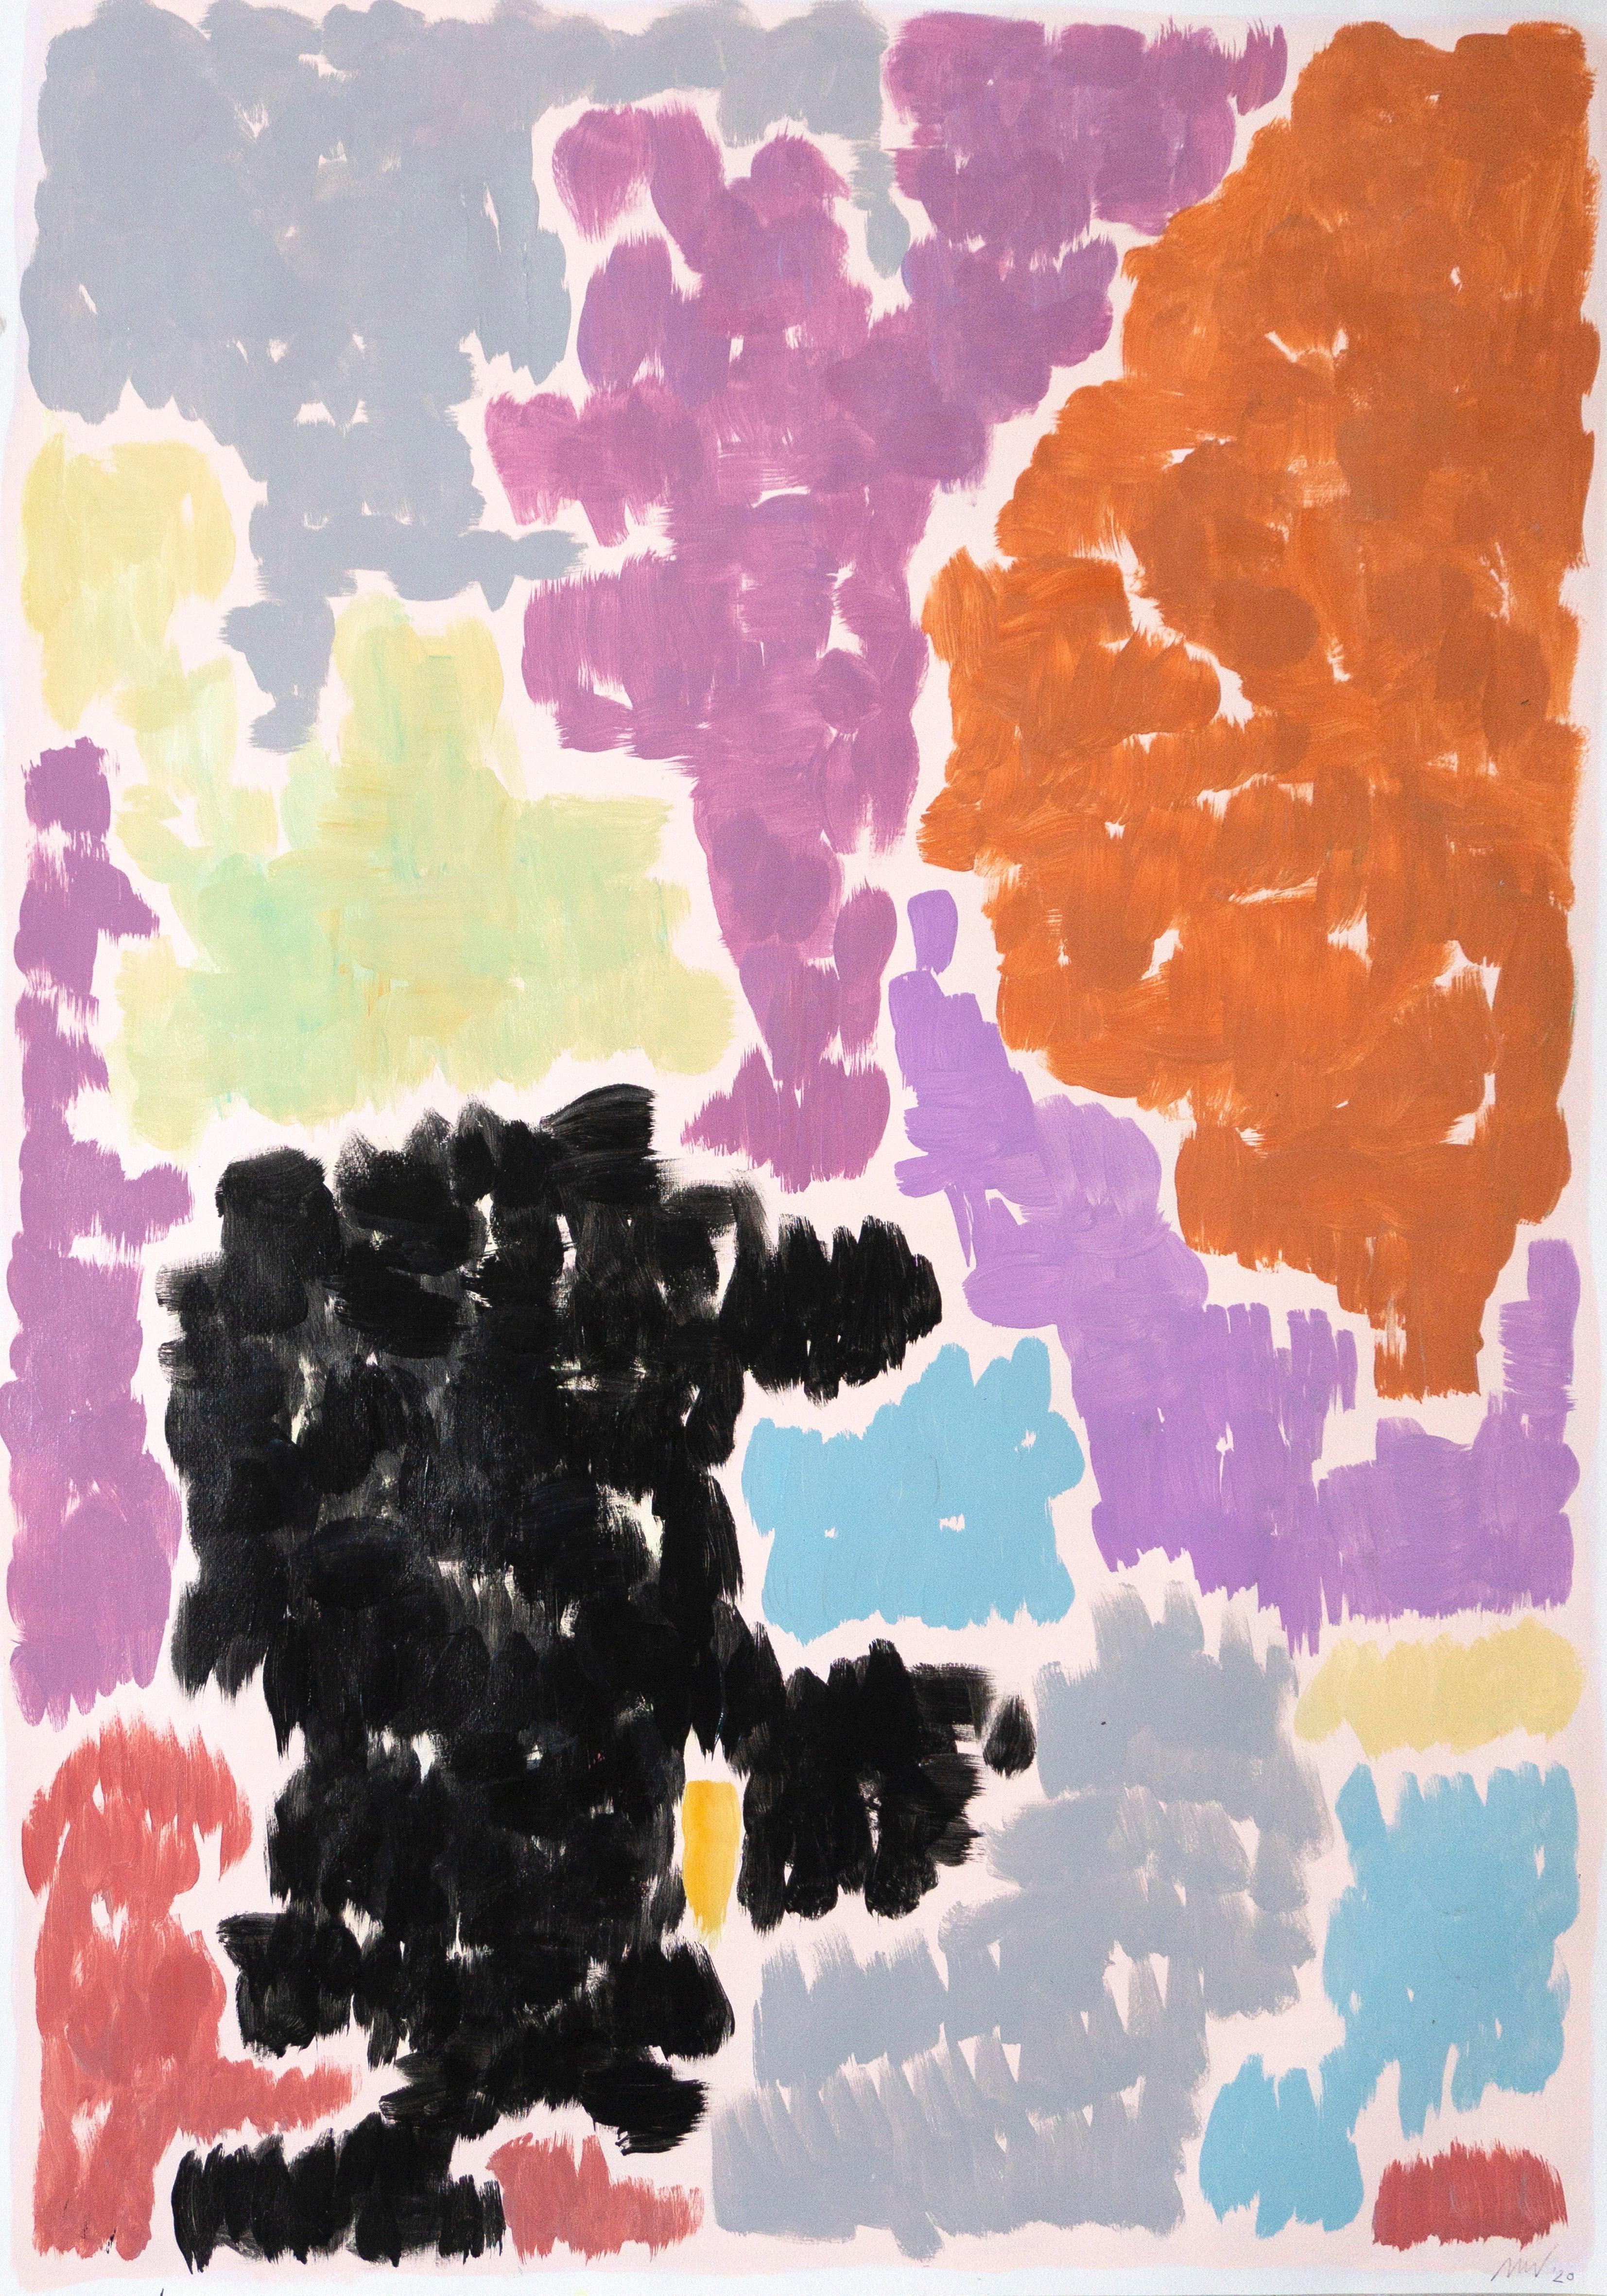 Purple Bougainvilleas, Art Deco Floral Painting in Purple Tones on Paper, 2020